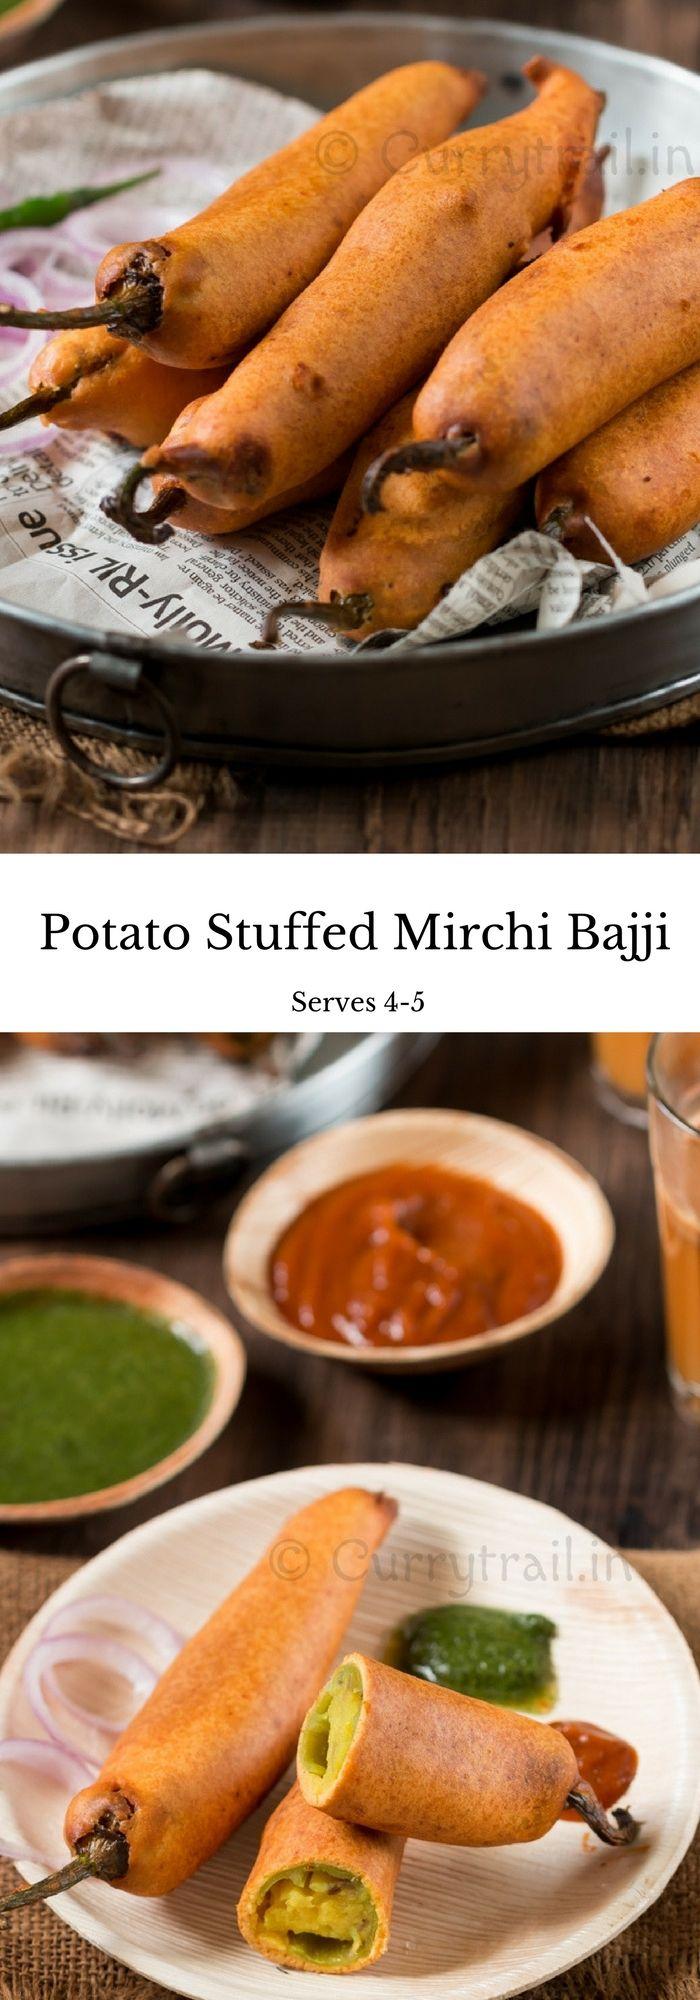 Milagai Bajji | Potato Stuffed Mirchi Bajji | Potato Stuffed Banana Pepper Fritters